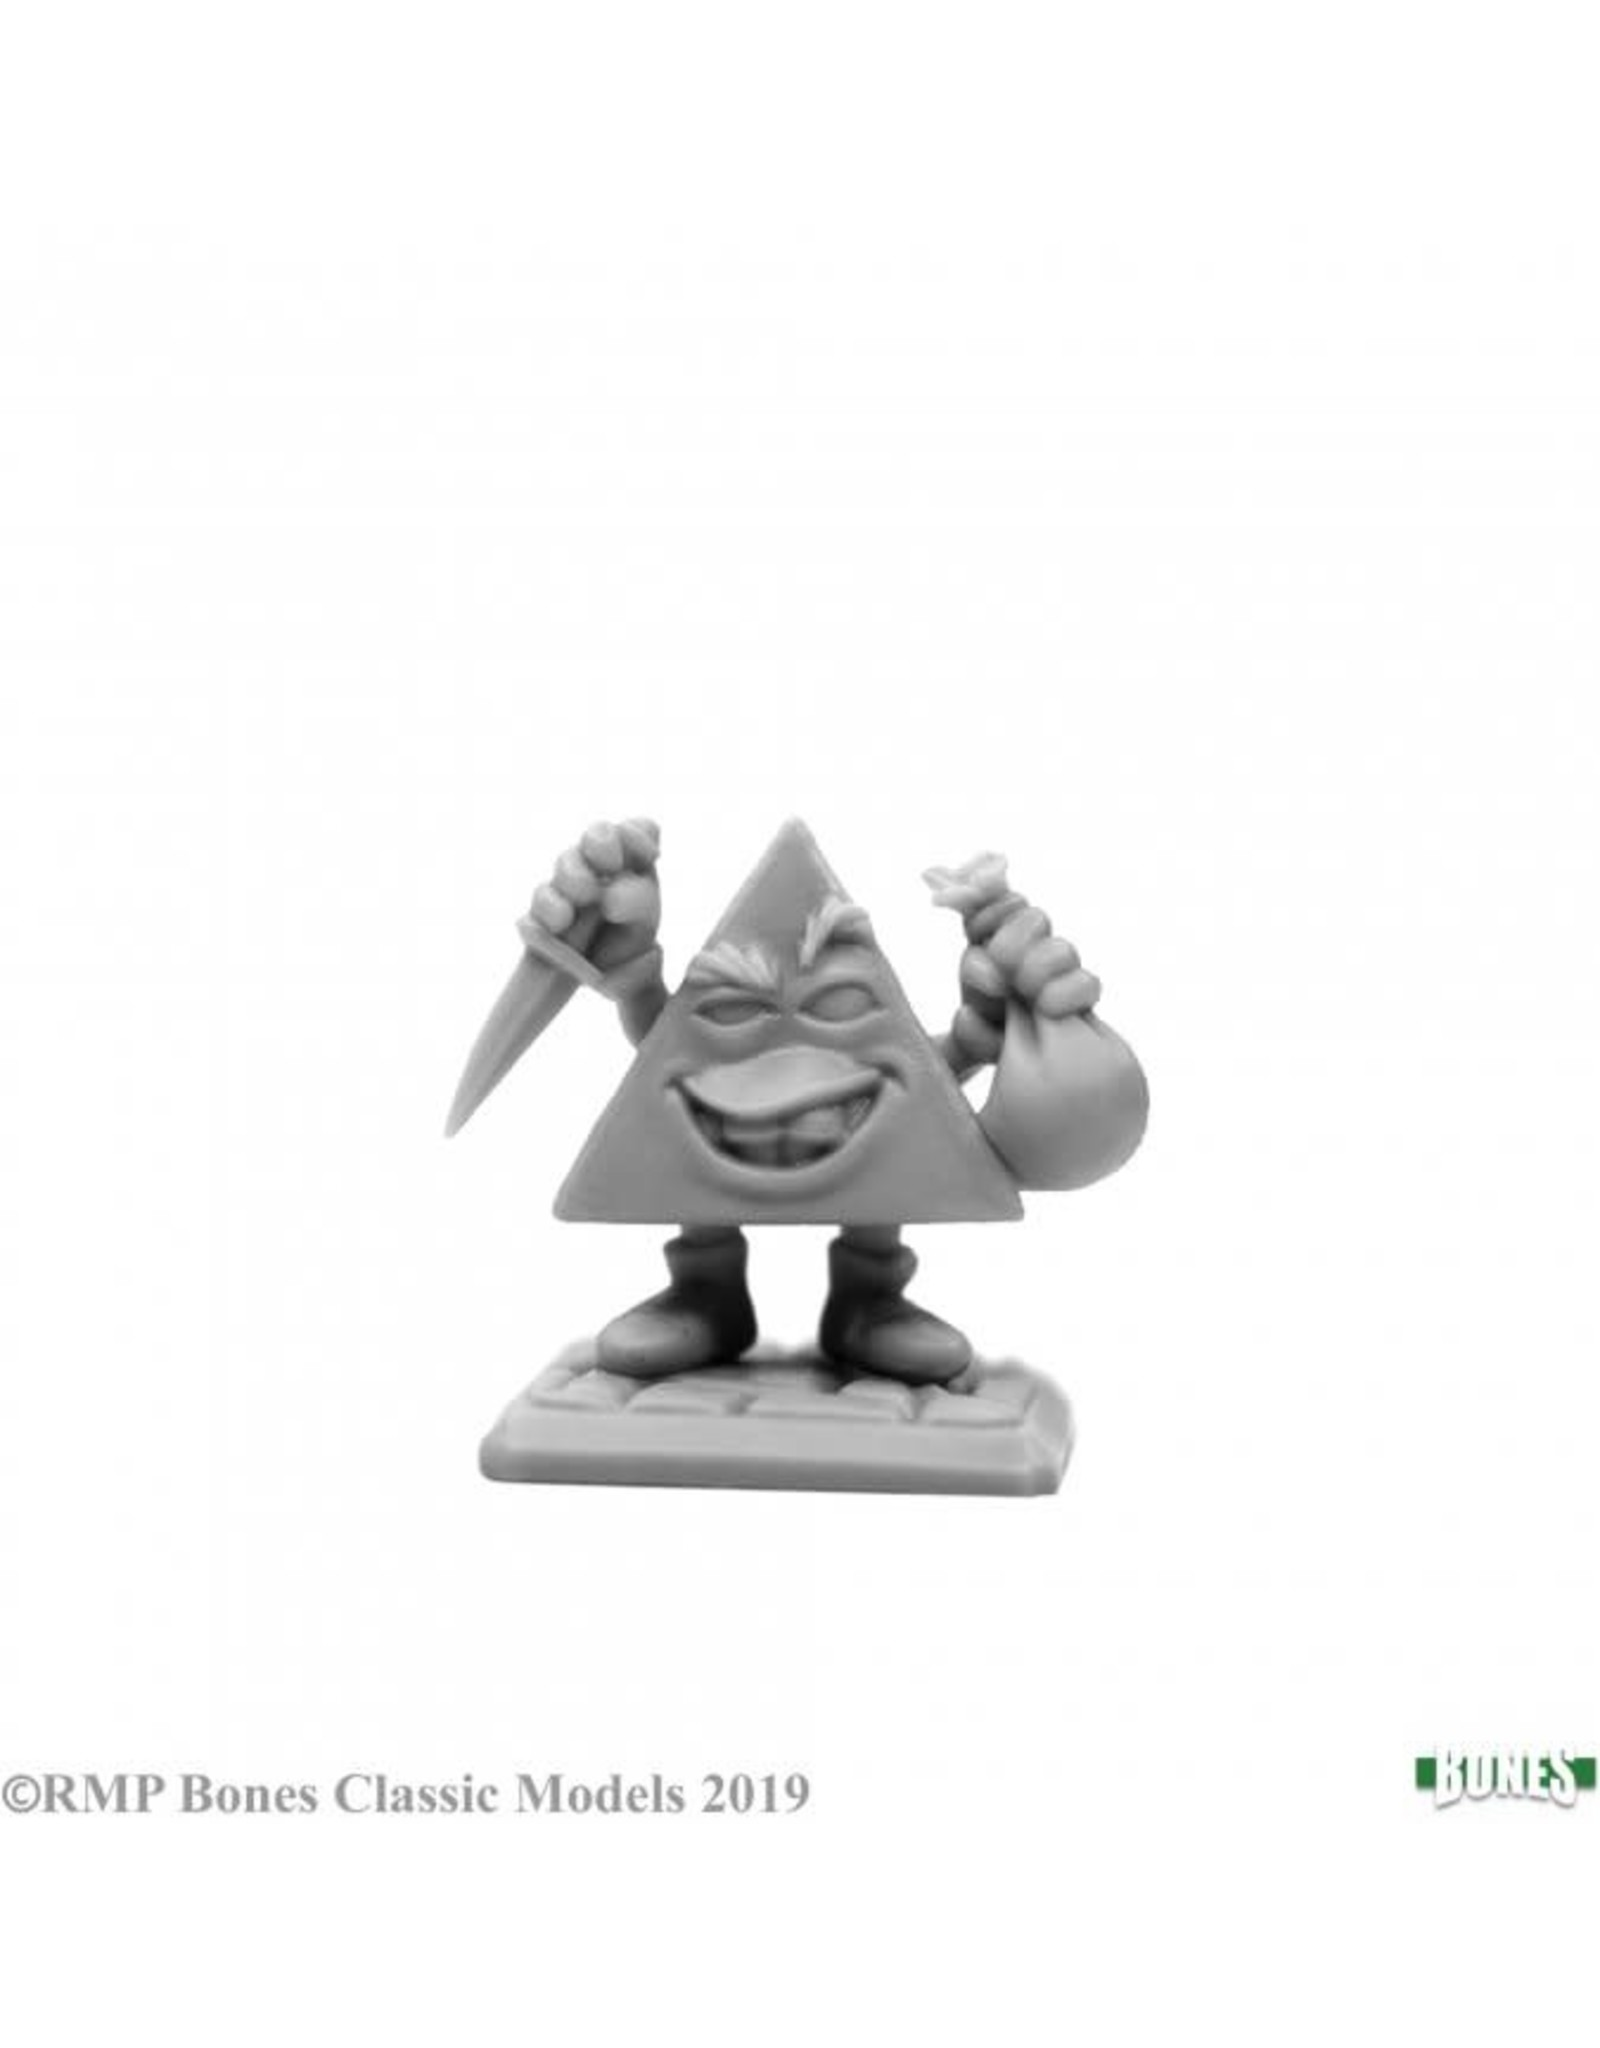 Reaper Miniatures Bones: High Rollers Pyram the Pincher, d4